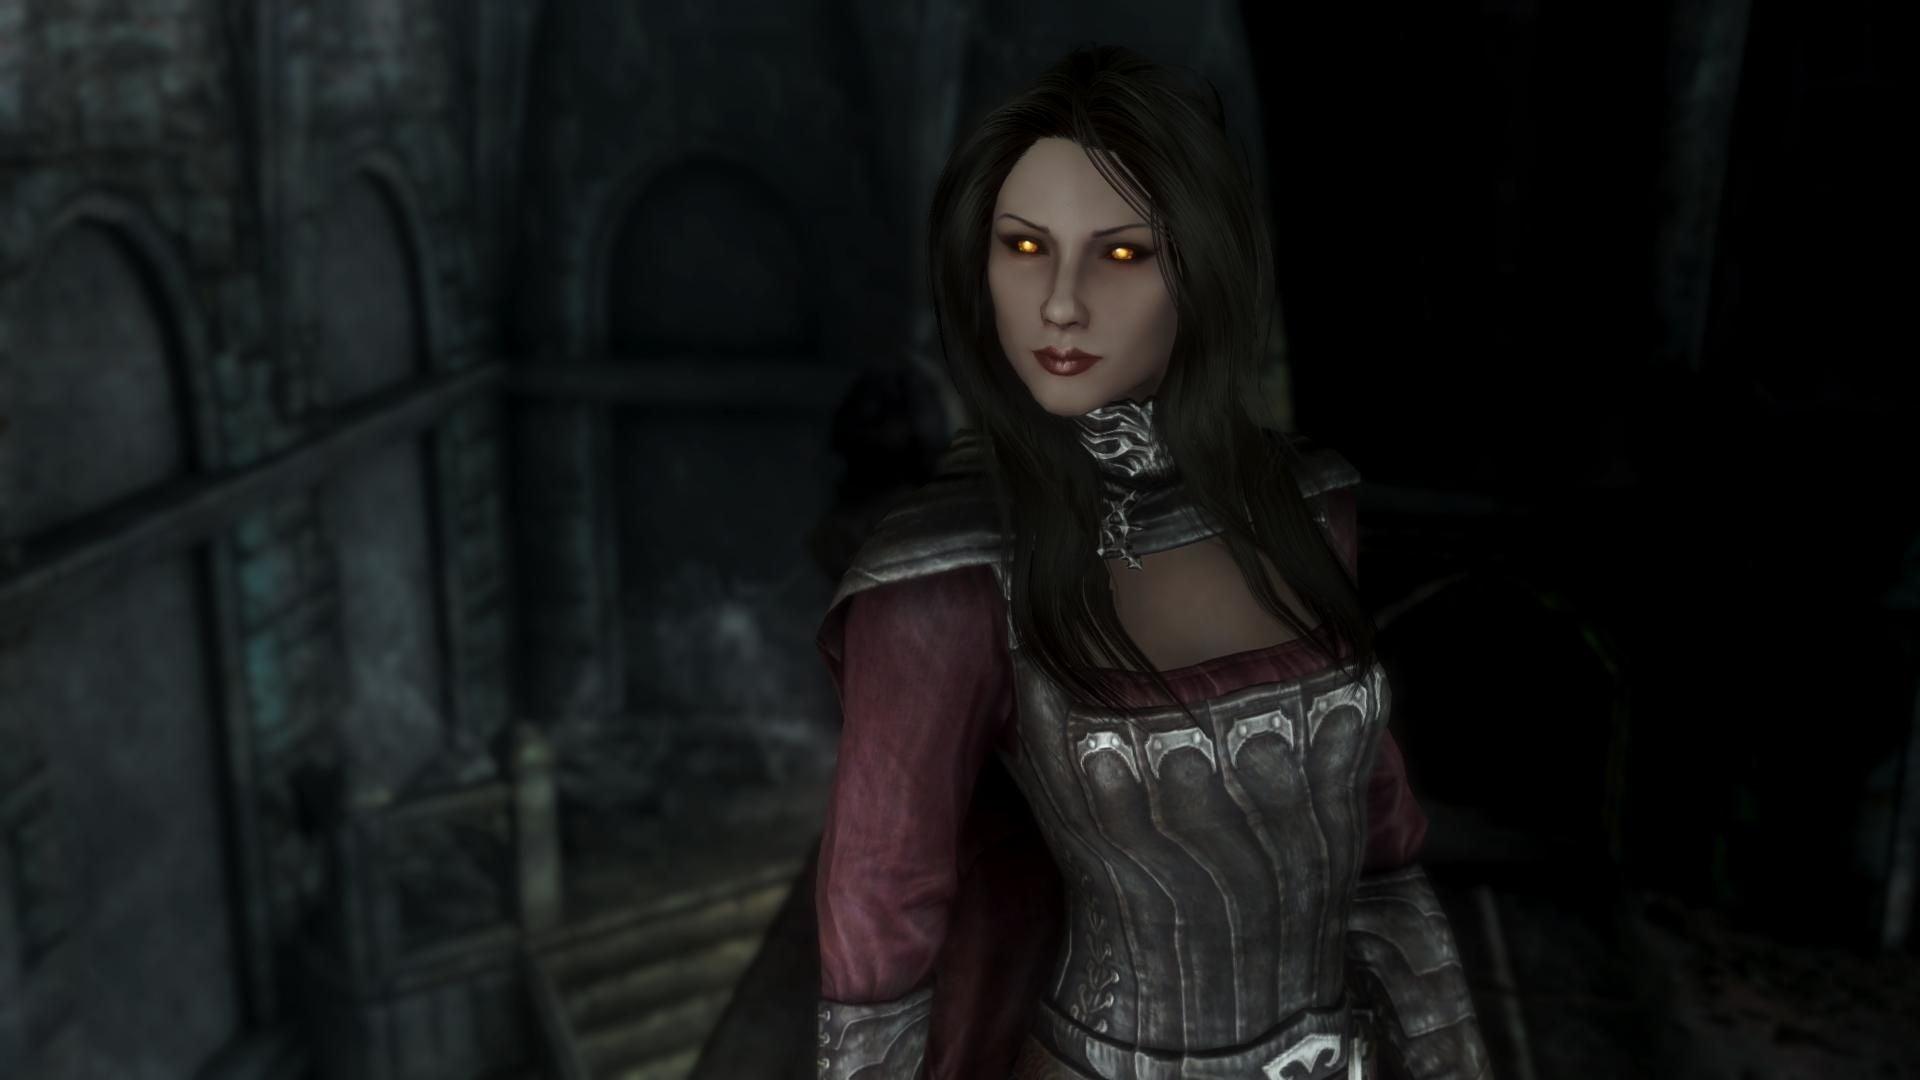 Serana from The Elder Scrolls V: Skyrim (Dawnguard)